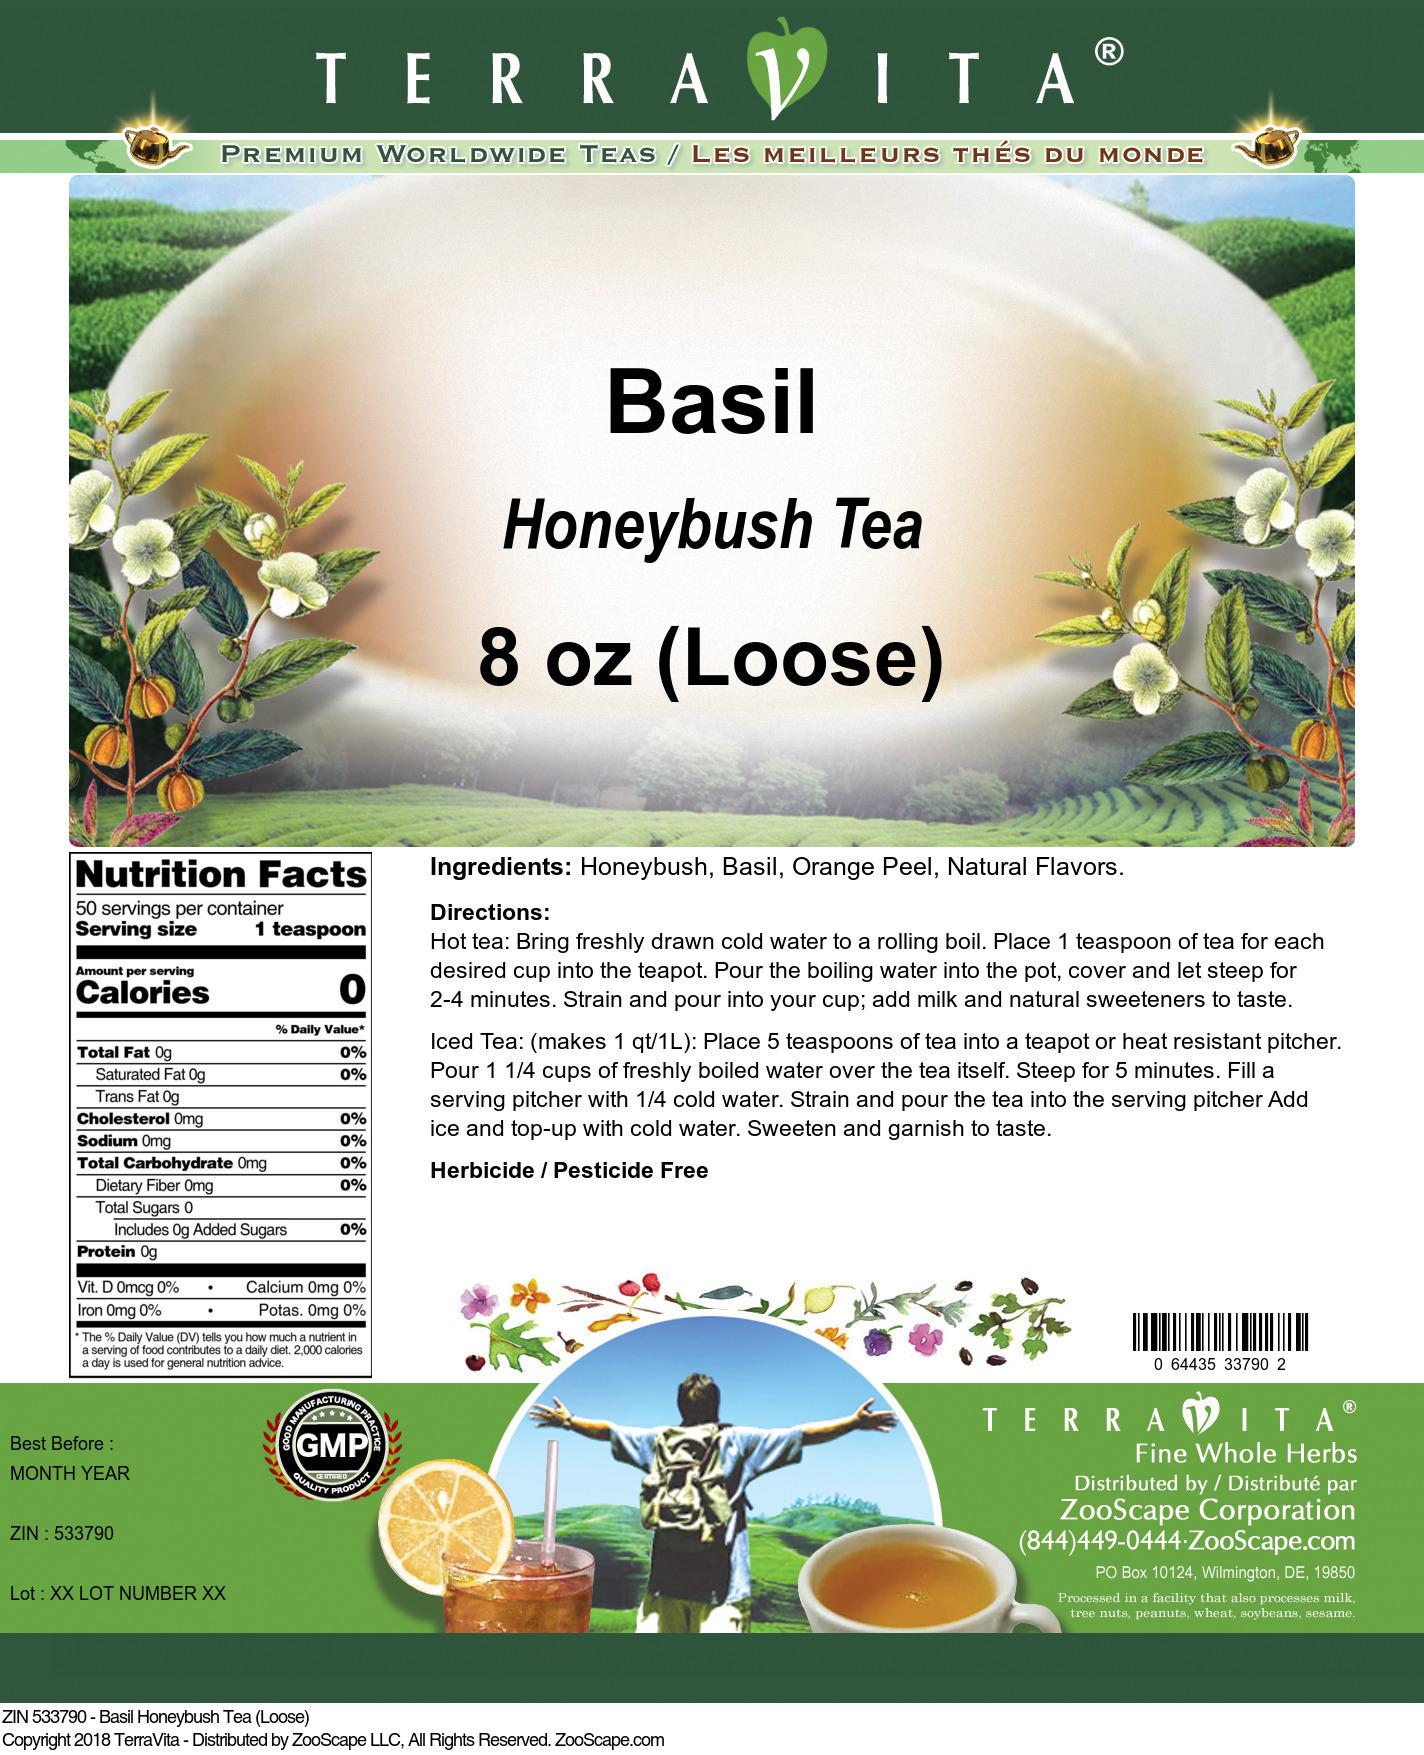 Basil Honeybush Tea (Loose)